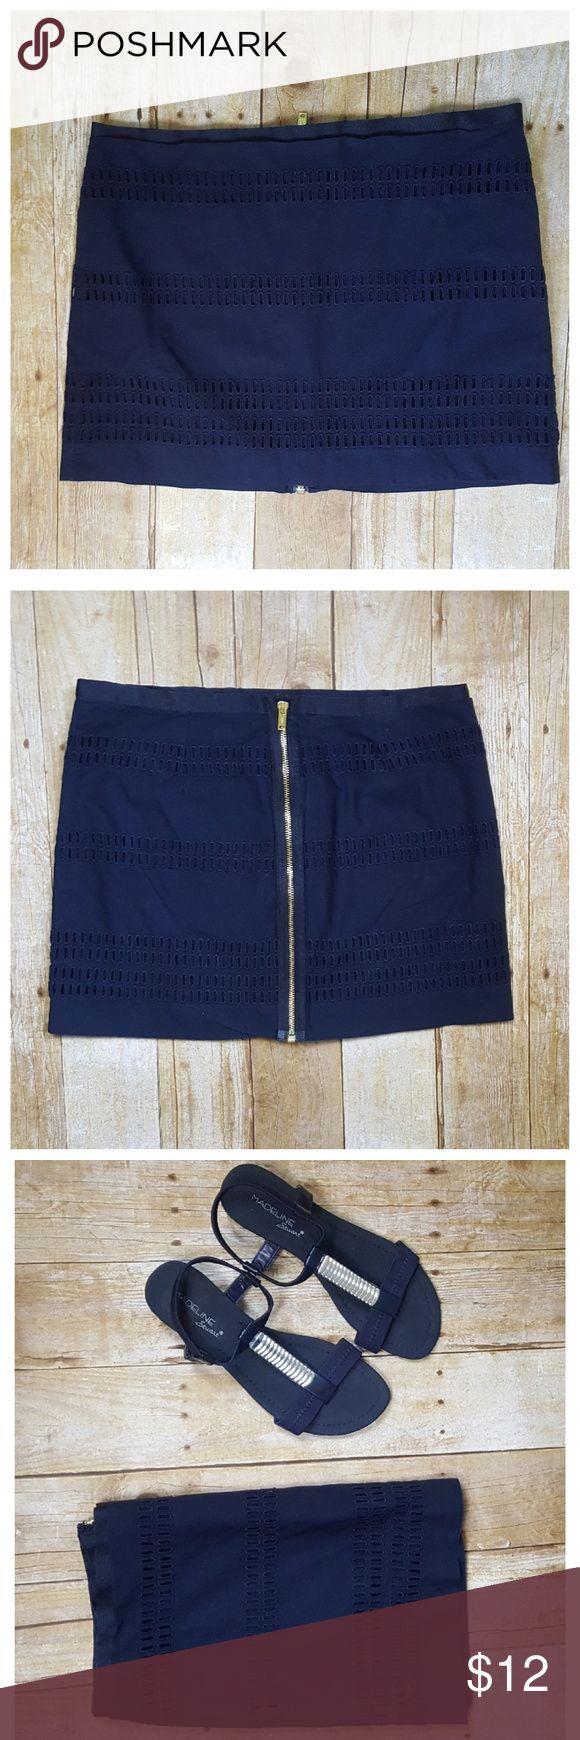 Stripe Eyelet Navy Zip Up Gap Skirt - size 4 Stripe Eyelet Navy Zip Up Gap Skirt   Shell / Lining 100% Cotton  Embroidery  100% Cotton GAP Skirts Mini